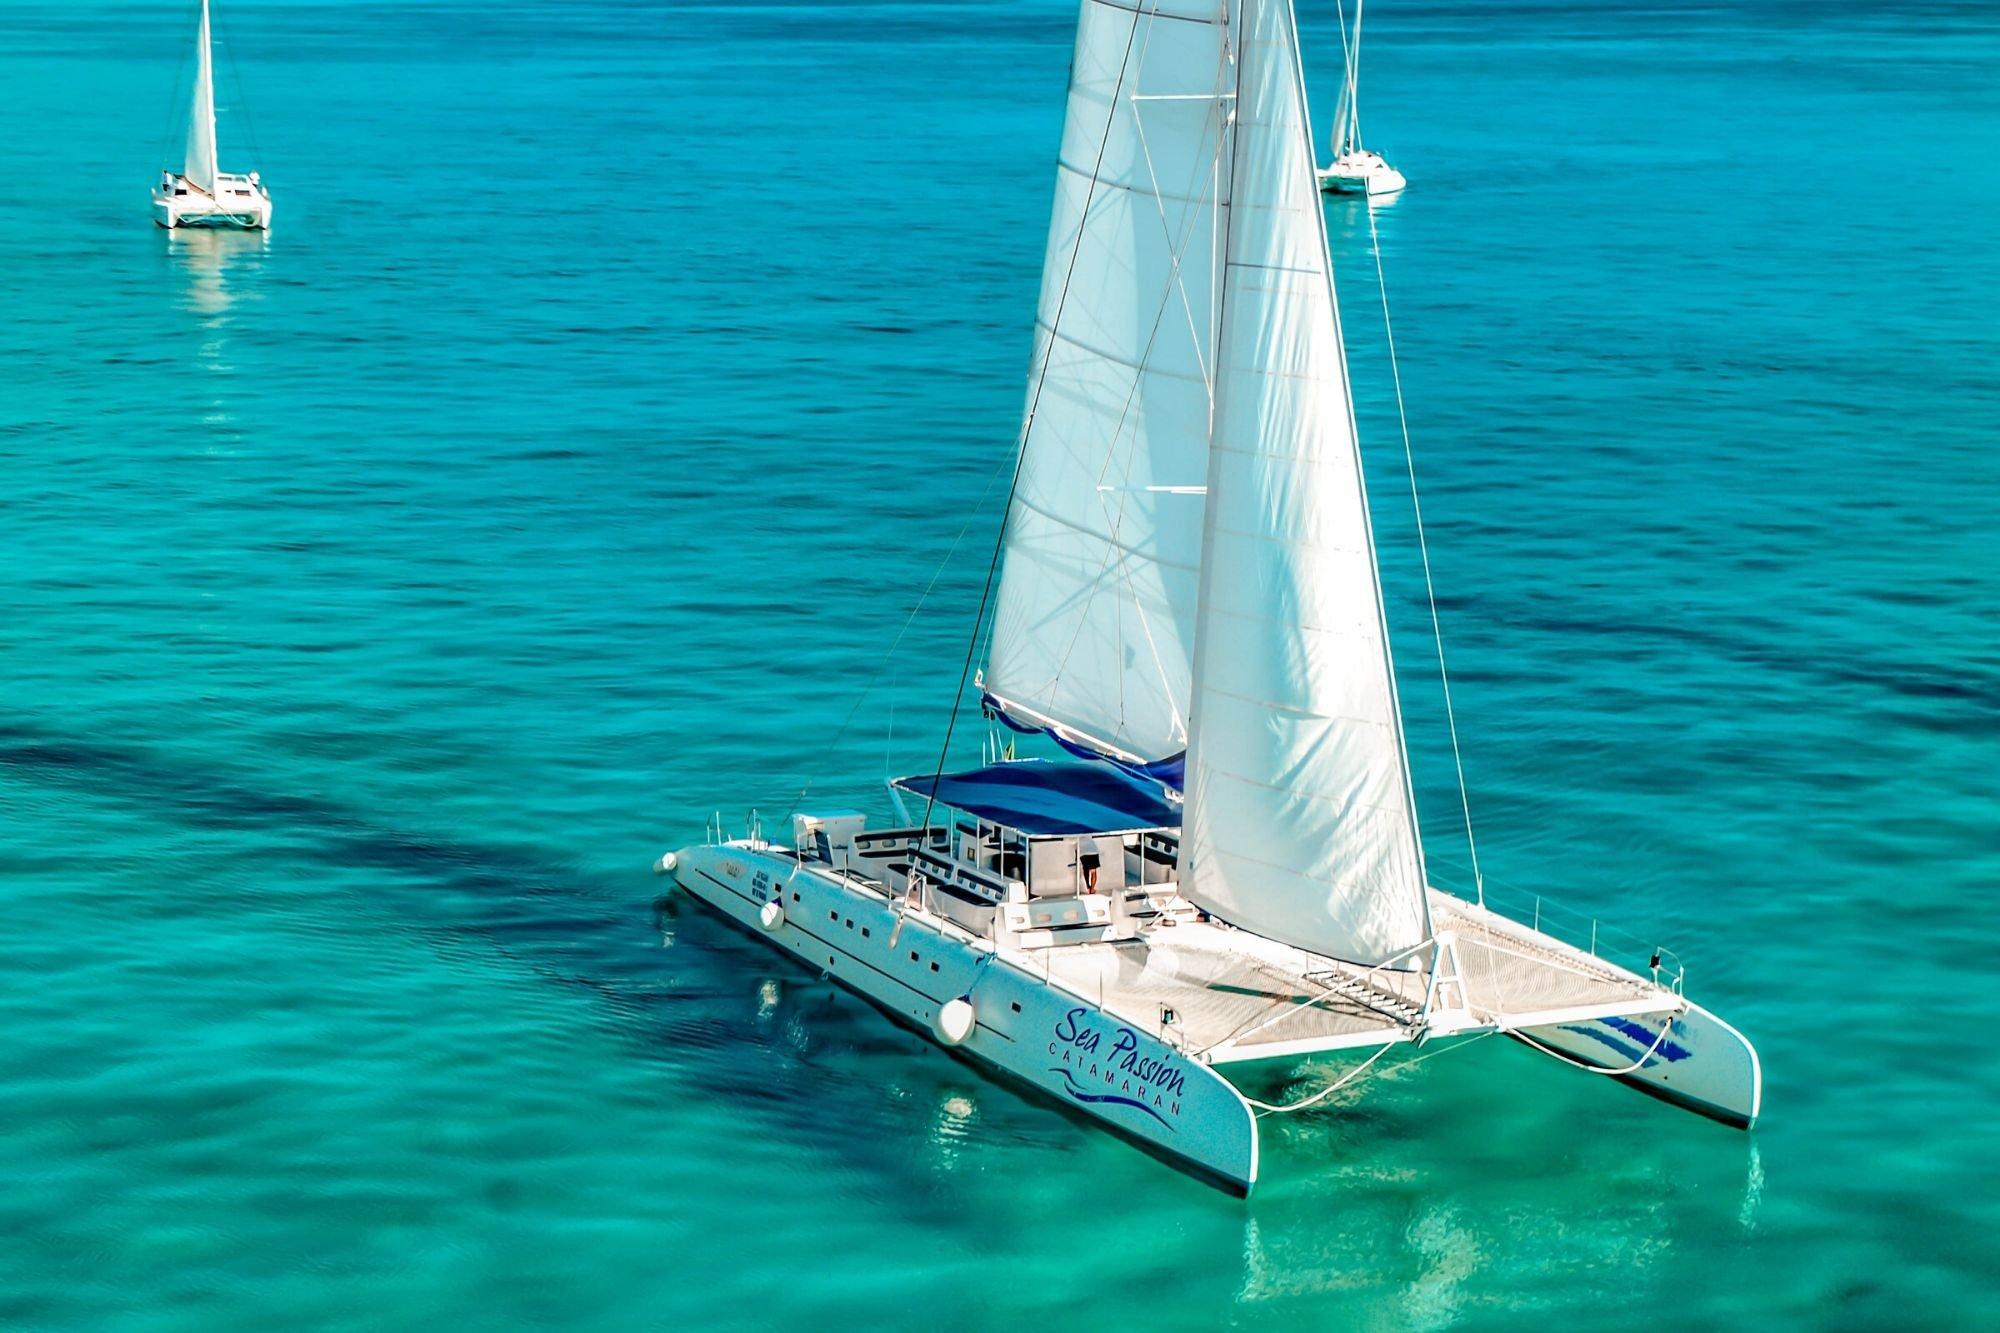 2 - HiRes - Private Isla Mujeres tour in catamaran - Sea Passion I II - Cancun Sailing